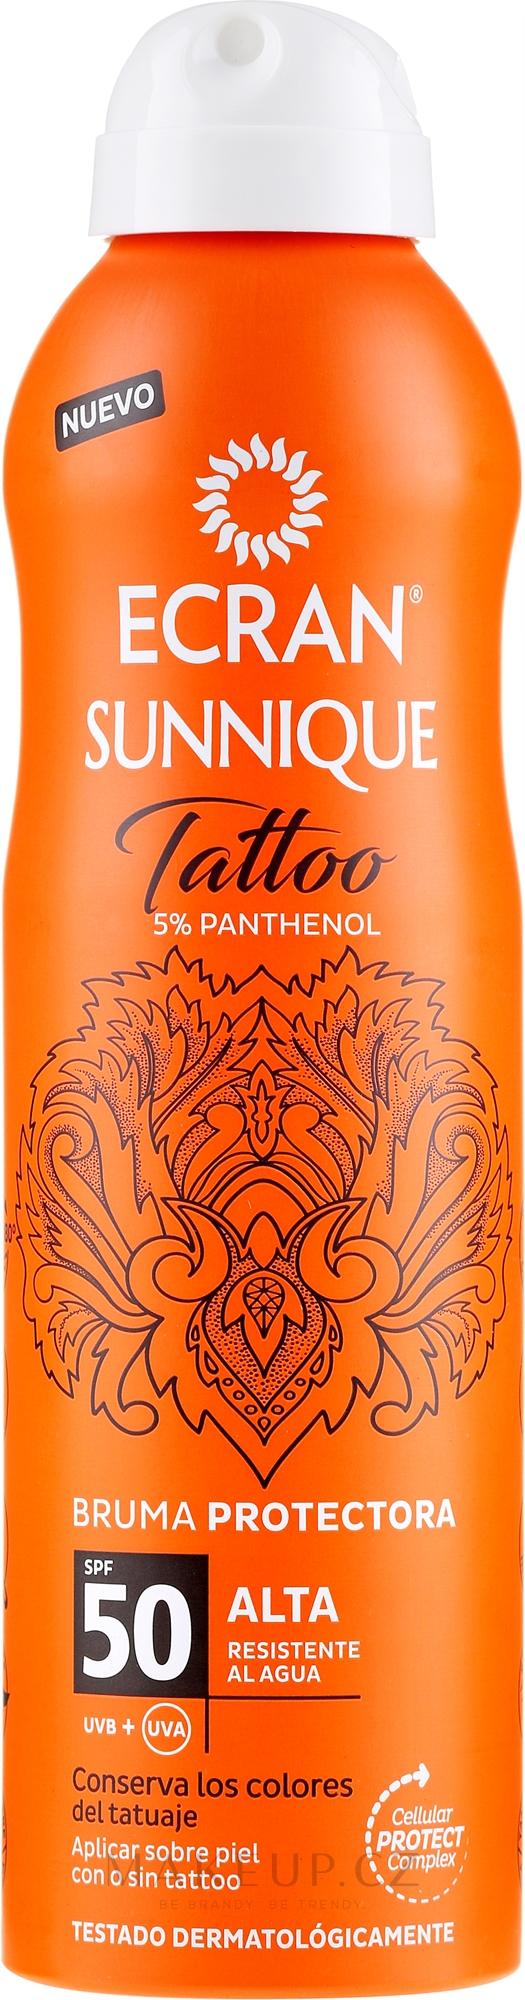 Sprej po opálení - Ecran Sunnique Tattoo Protective Mist SPF50 — foto 250 ml